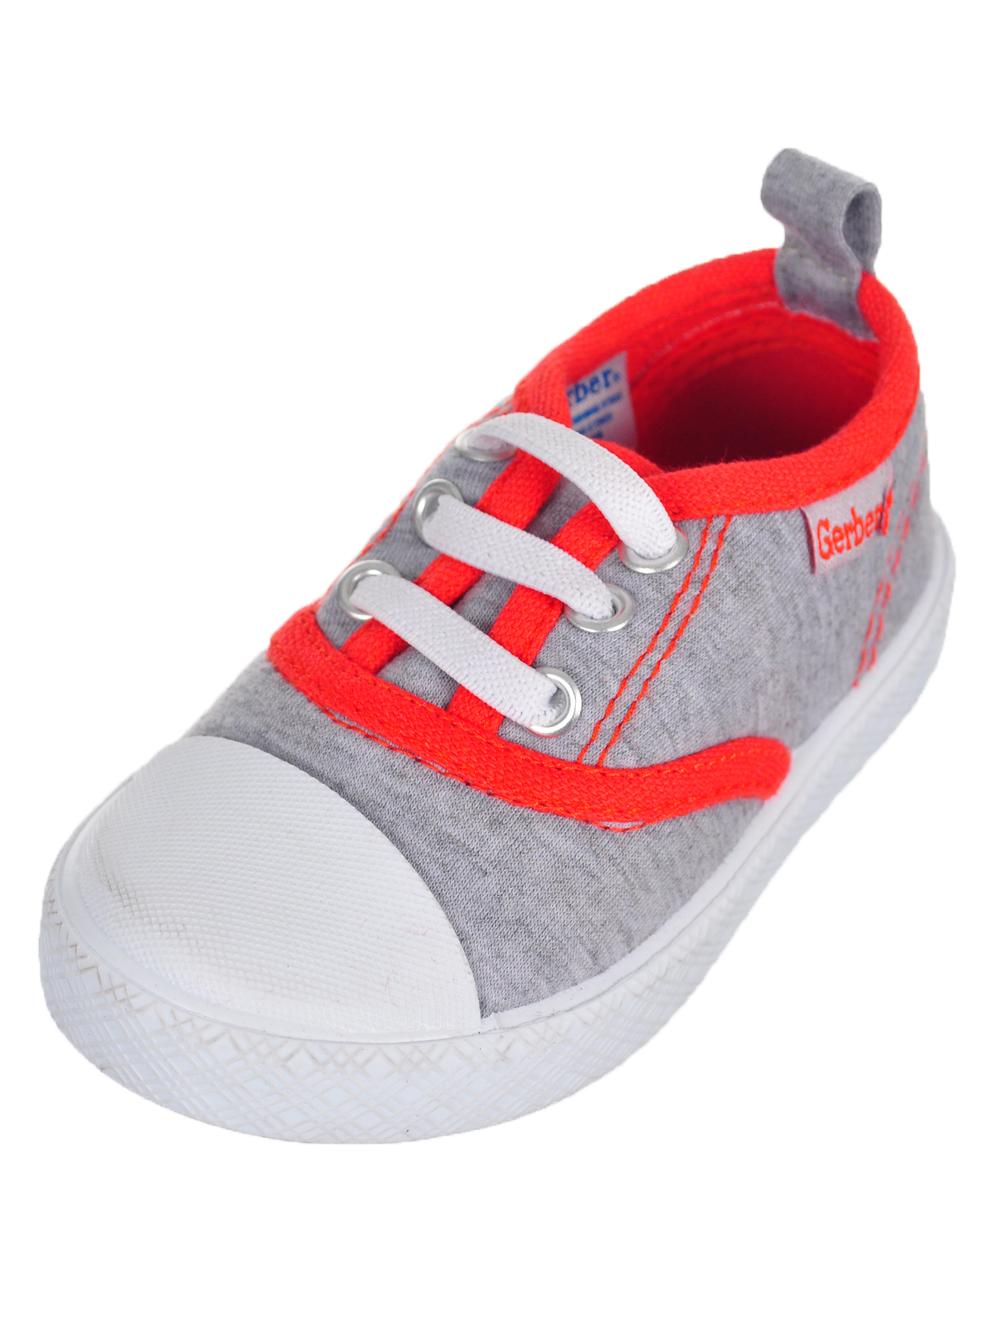 Gerber Boys' First Walker Low-Top Sneakers (Sizes 3 - 6)